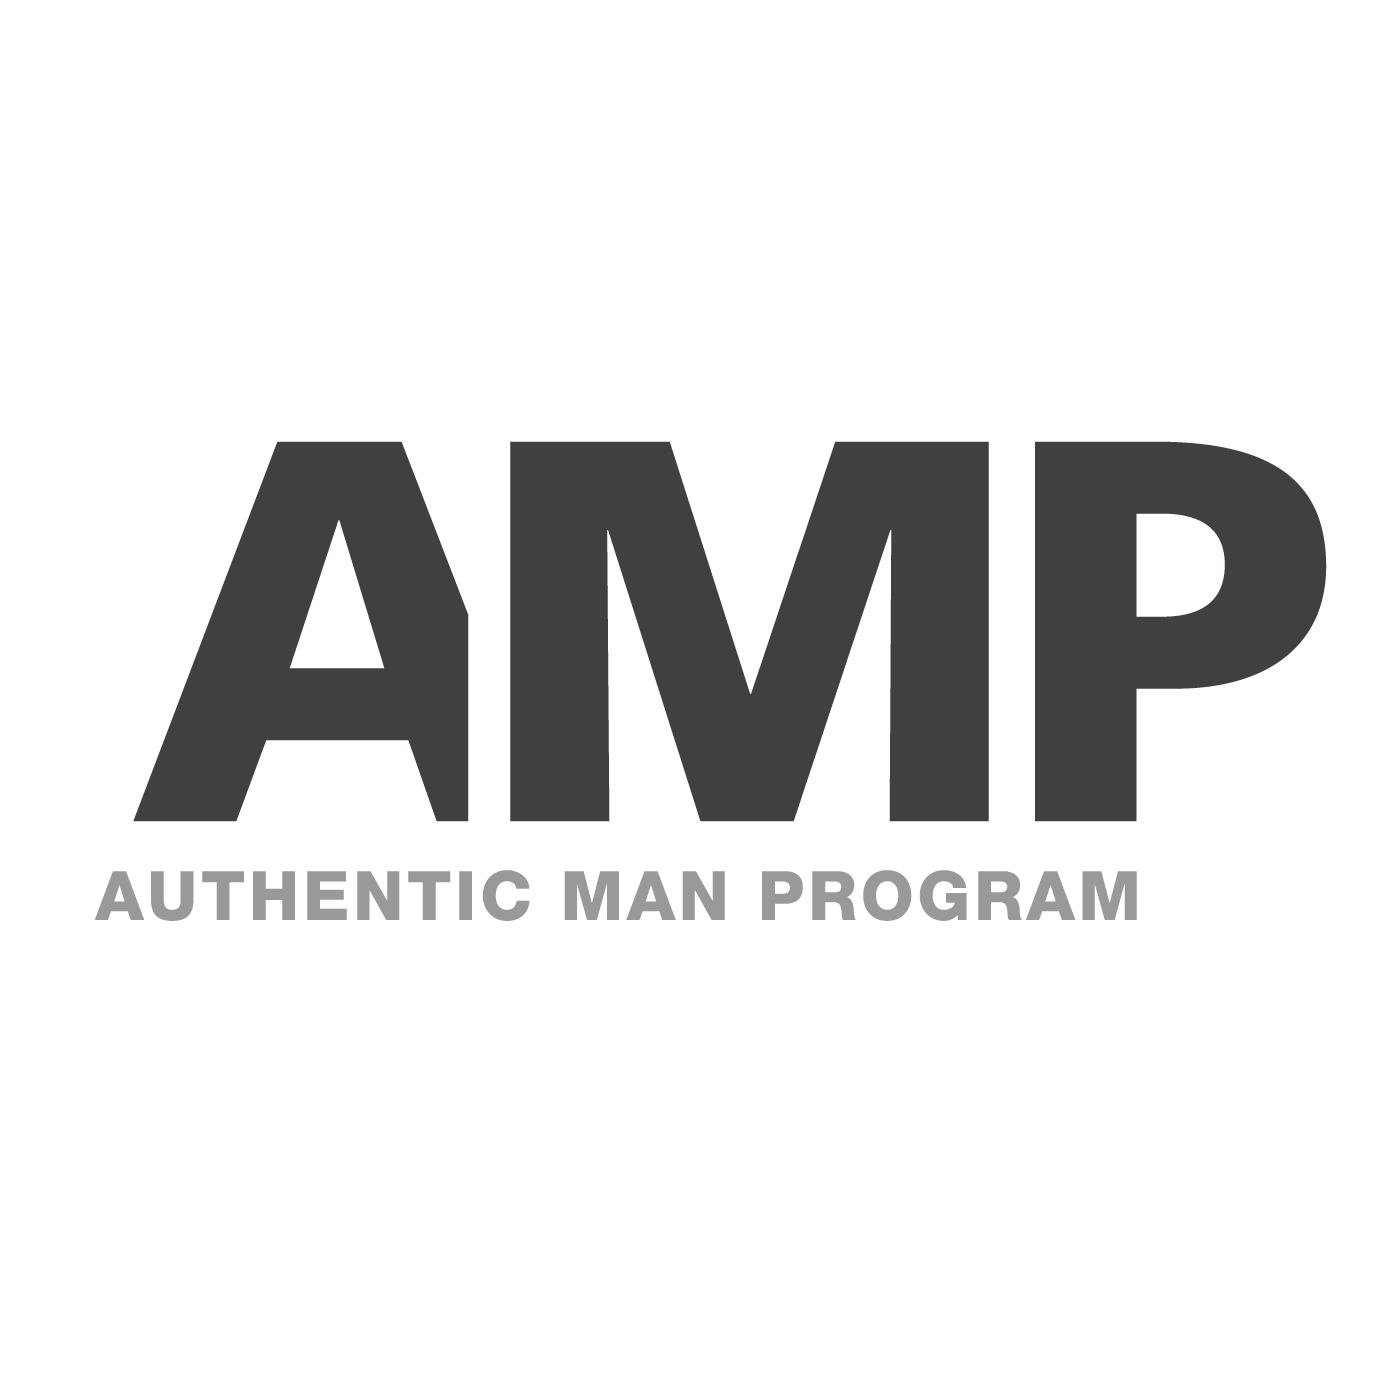 Authentic Man Program